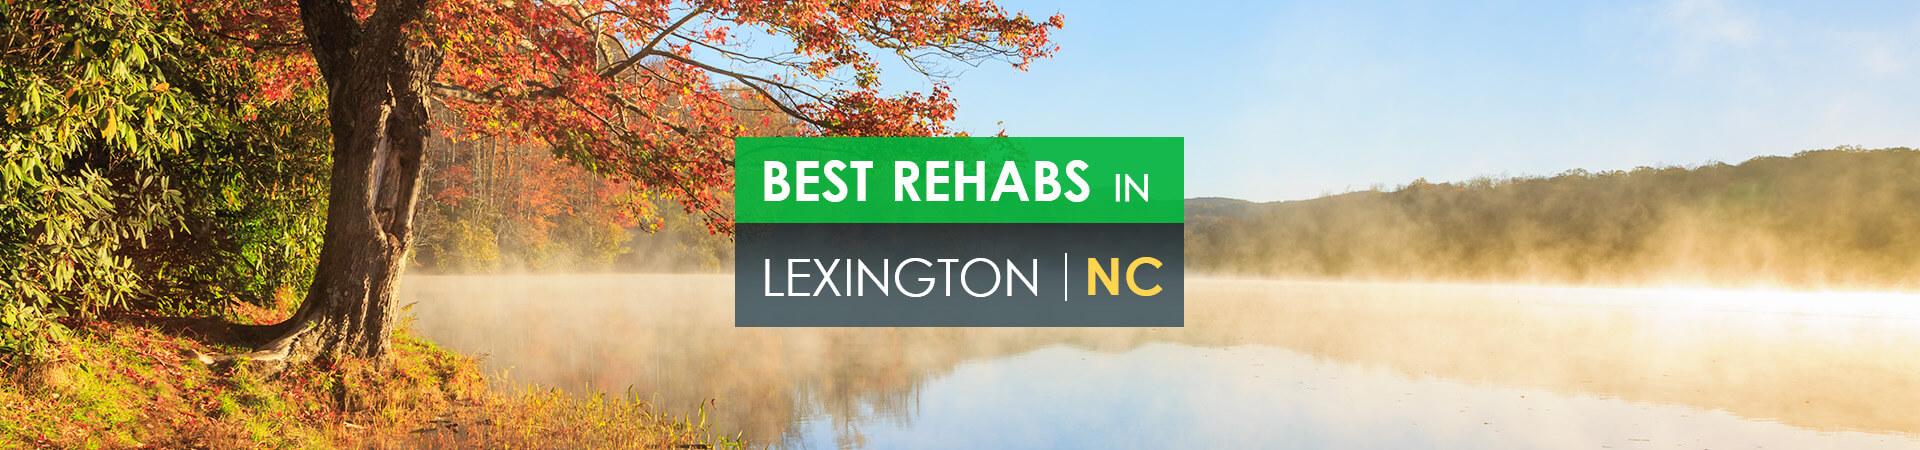 Best rehabs in Lexington, NC